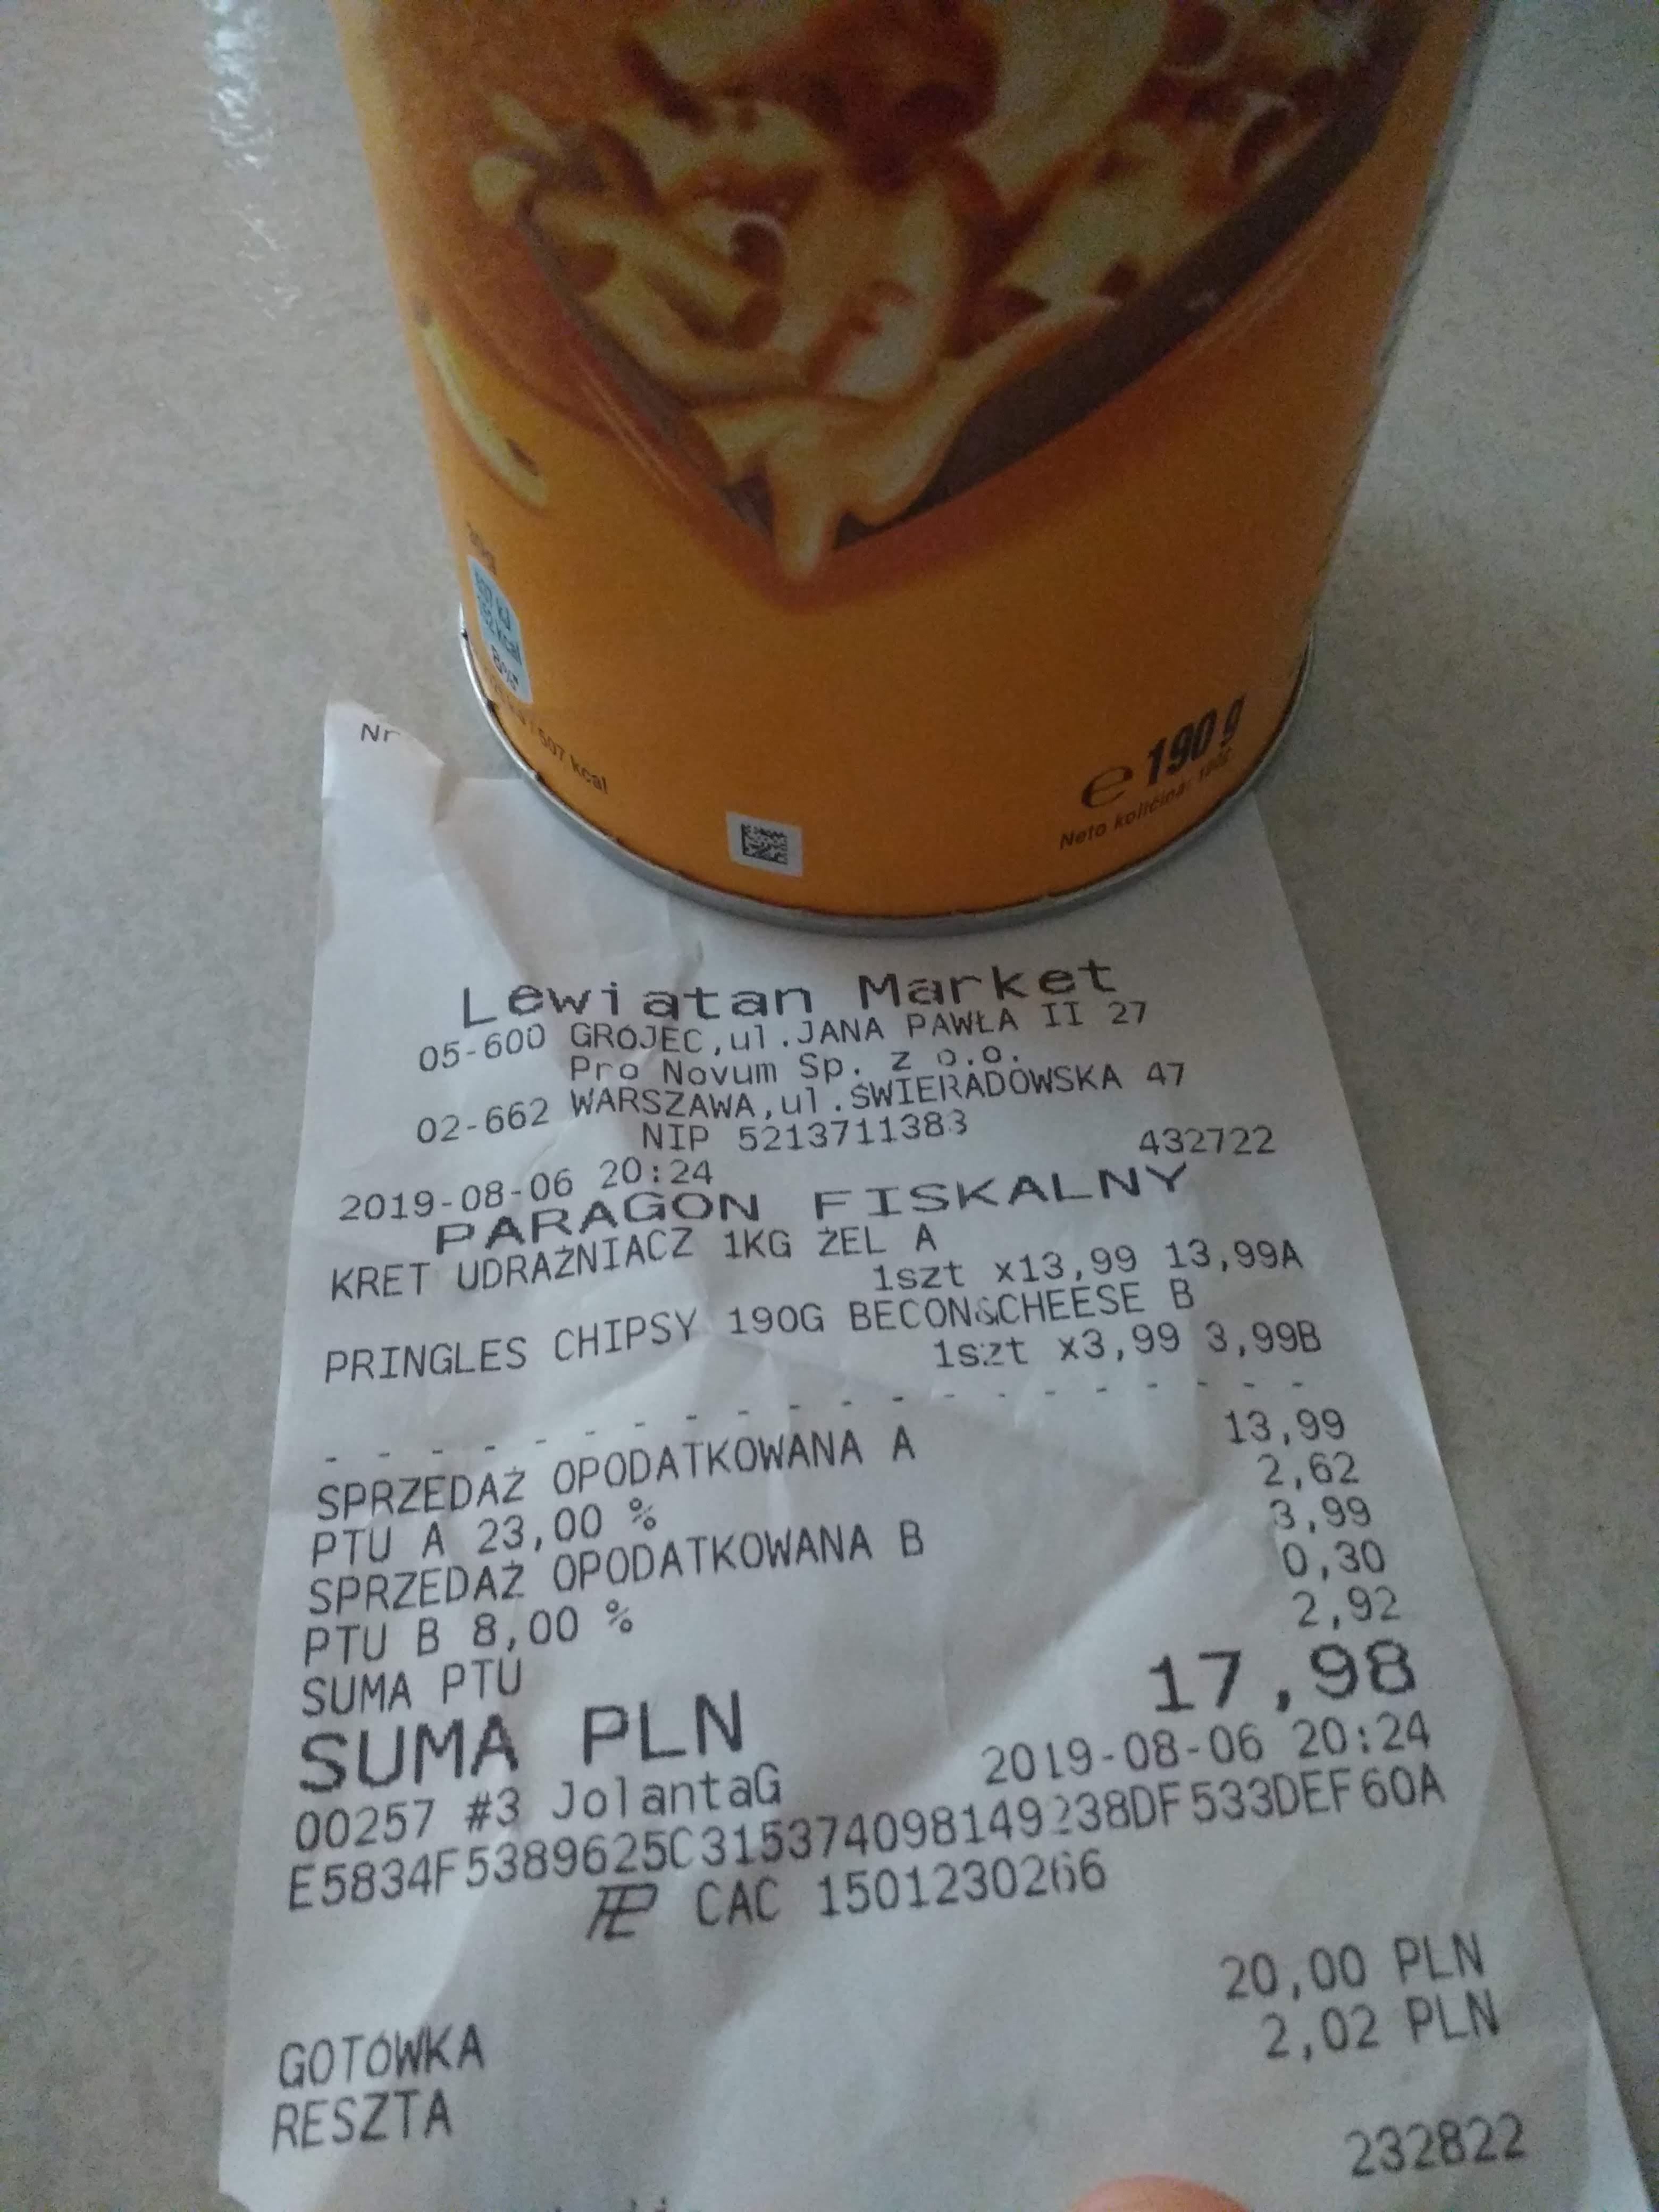 Pringelsy za 3.99 lewiatan Grójec